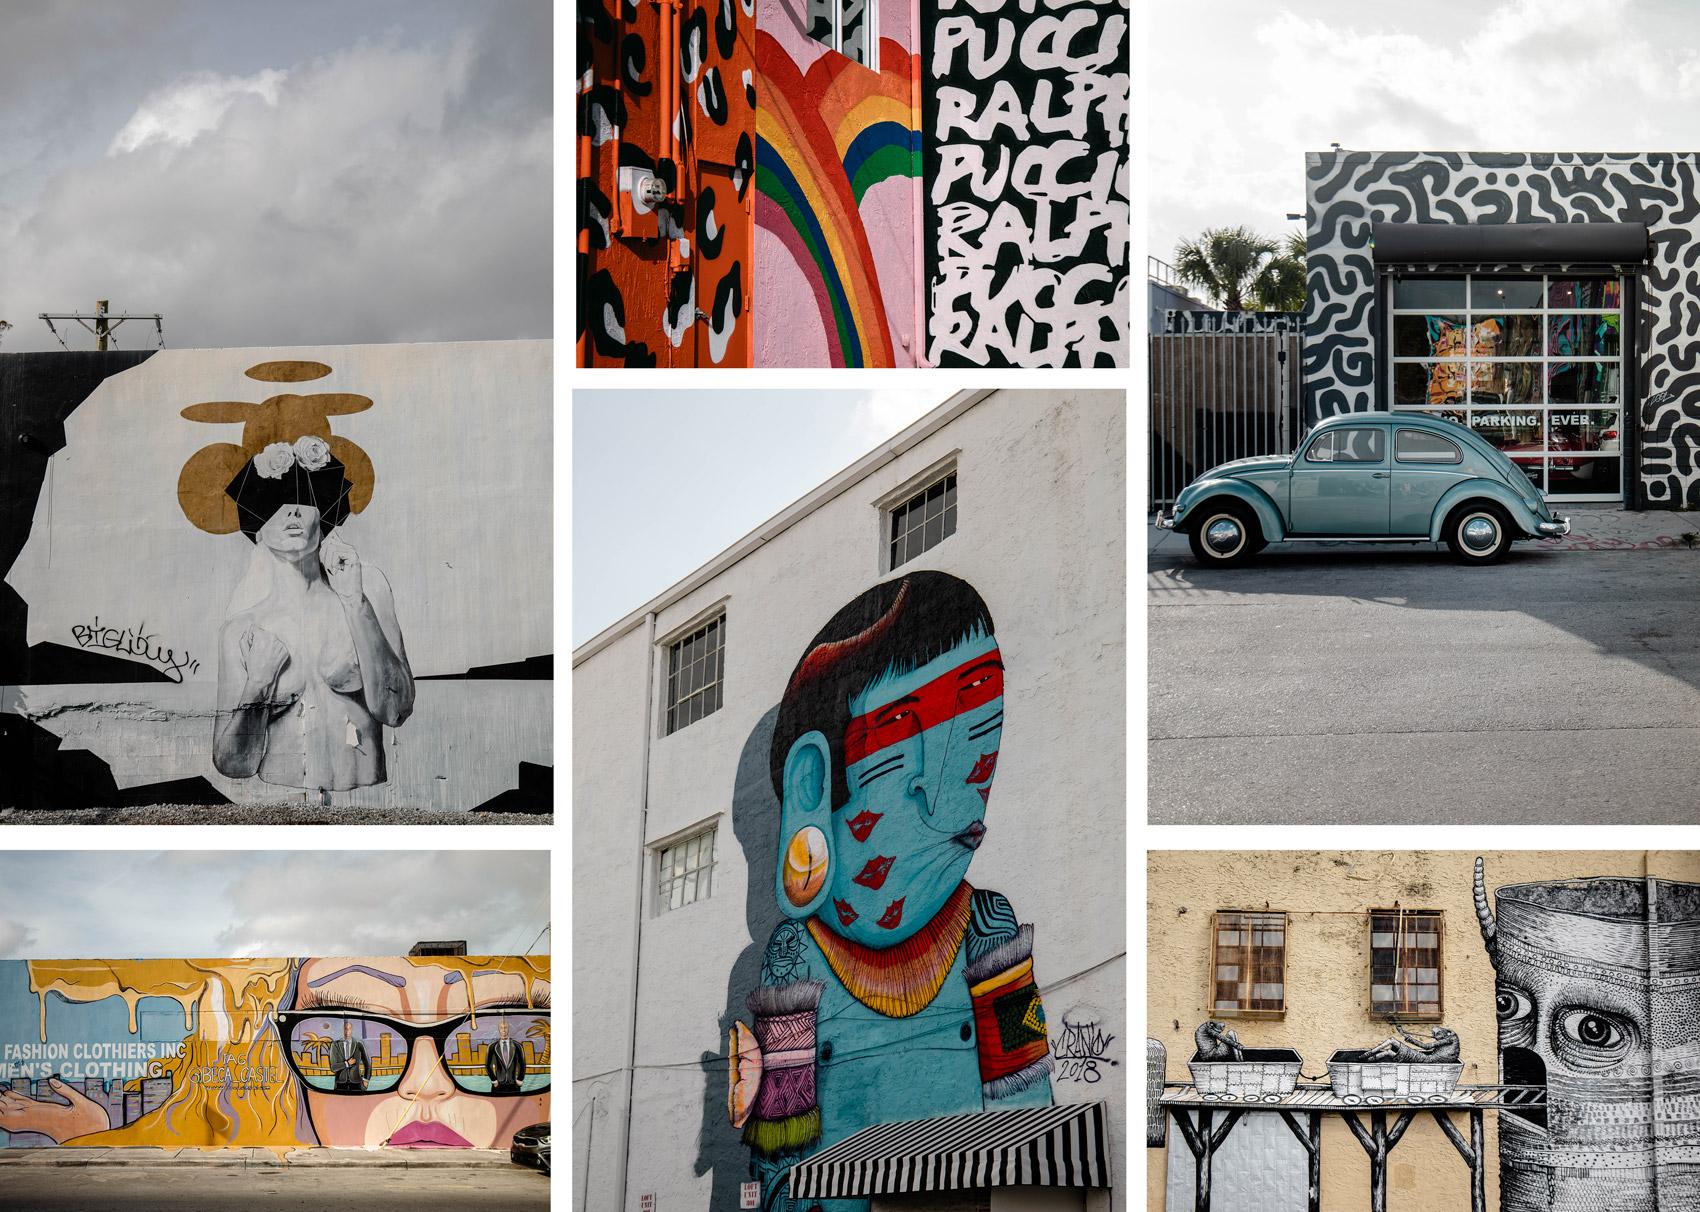 visiter Wynwood incontournable quartier de street art